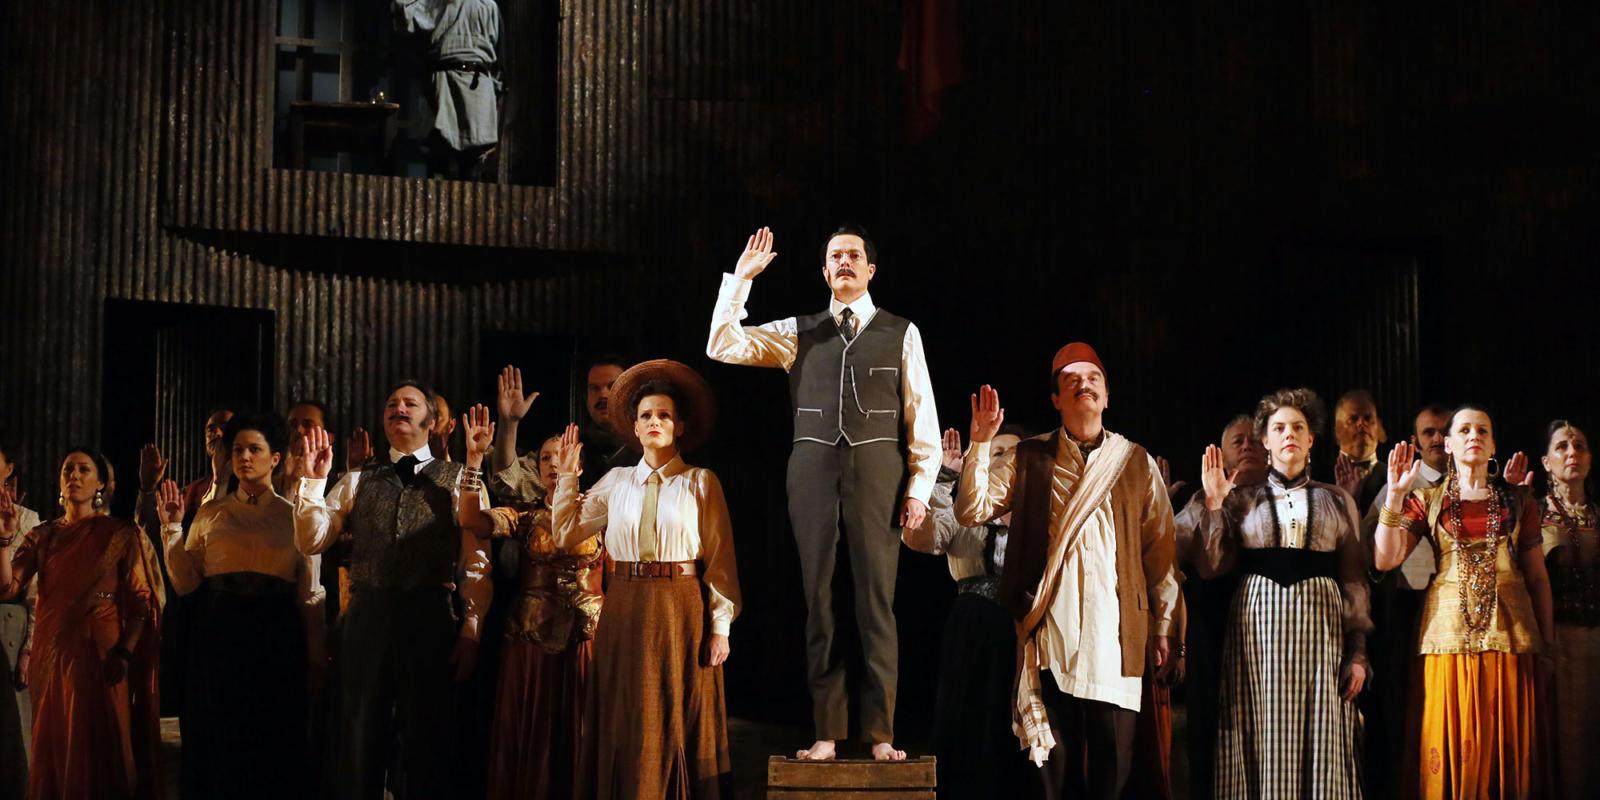 ENO Satyagraha: Toby Spence, Charlotte Beament and the ENO Chorus (c) Donald Cooper